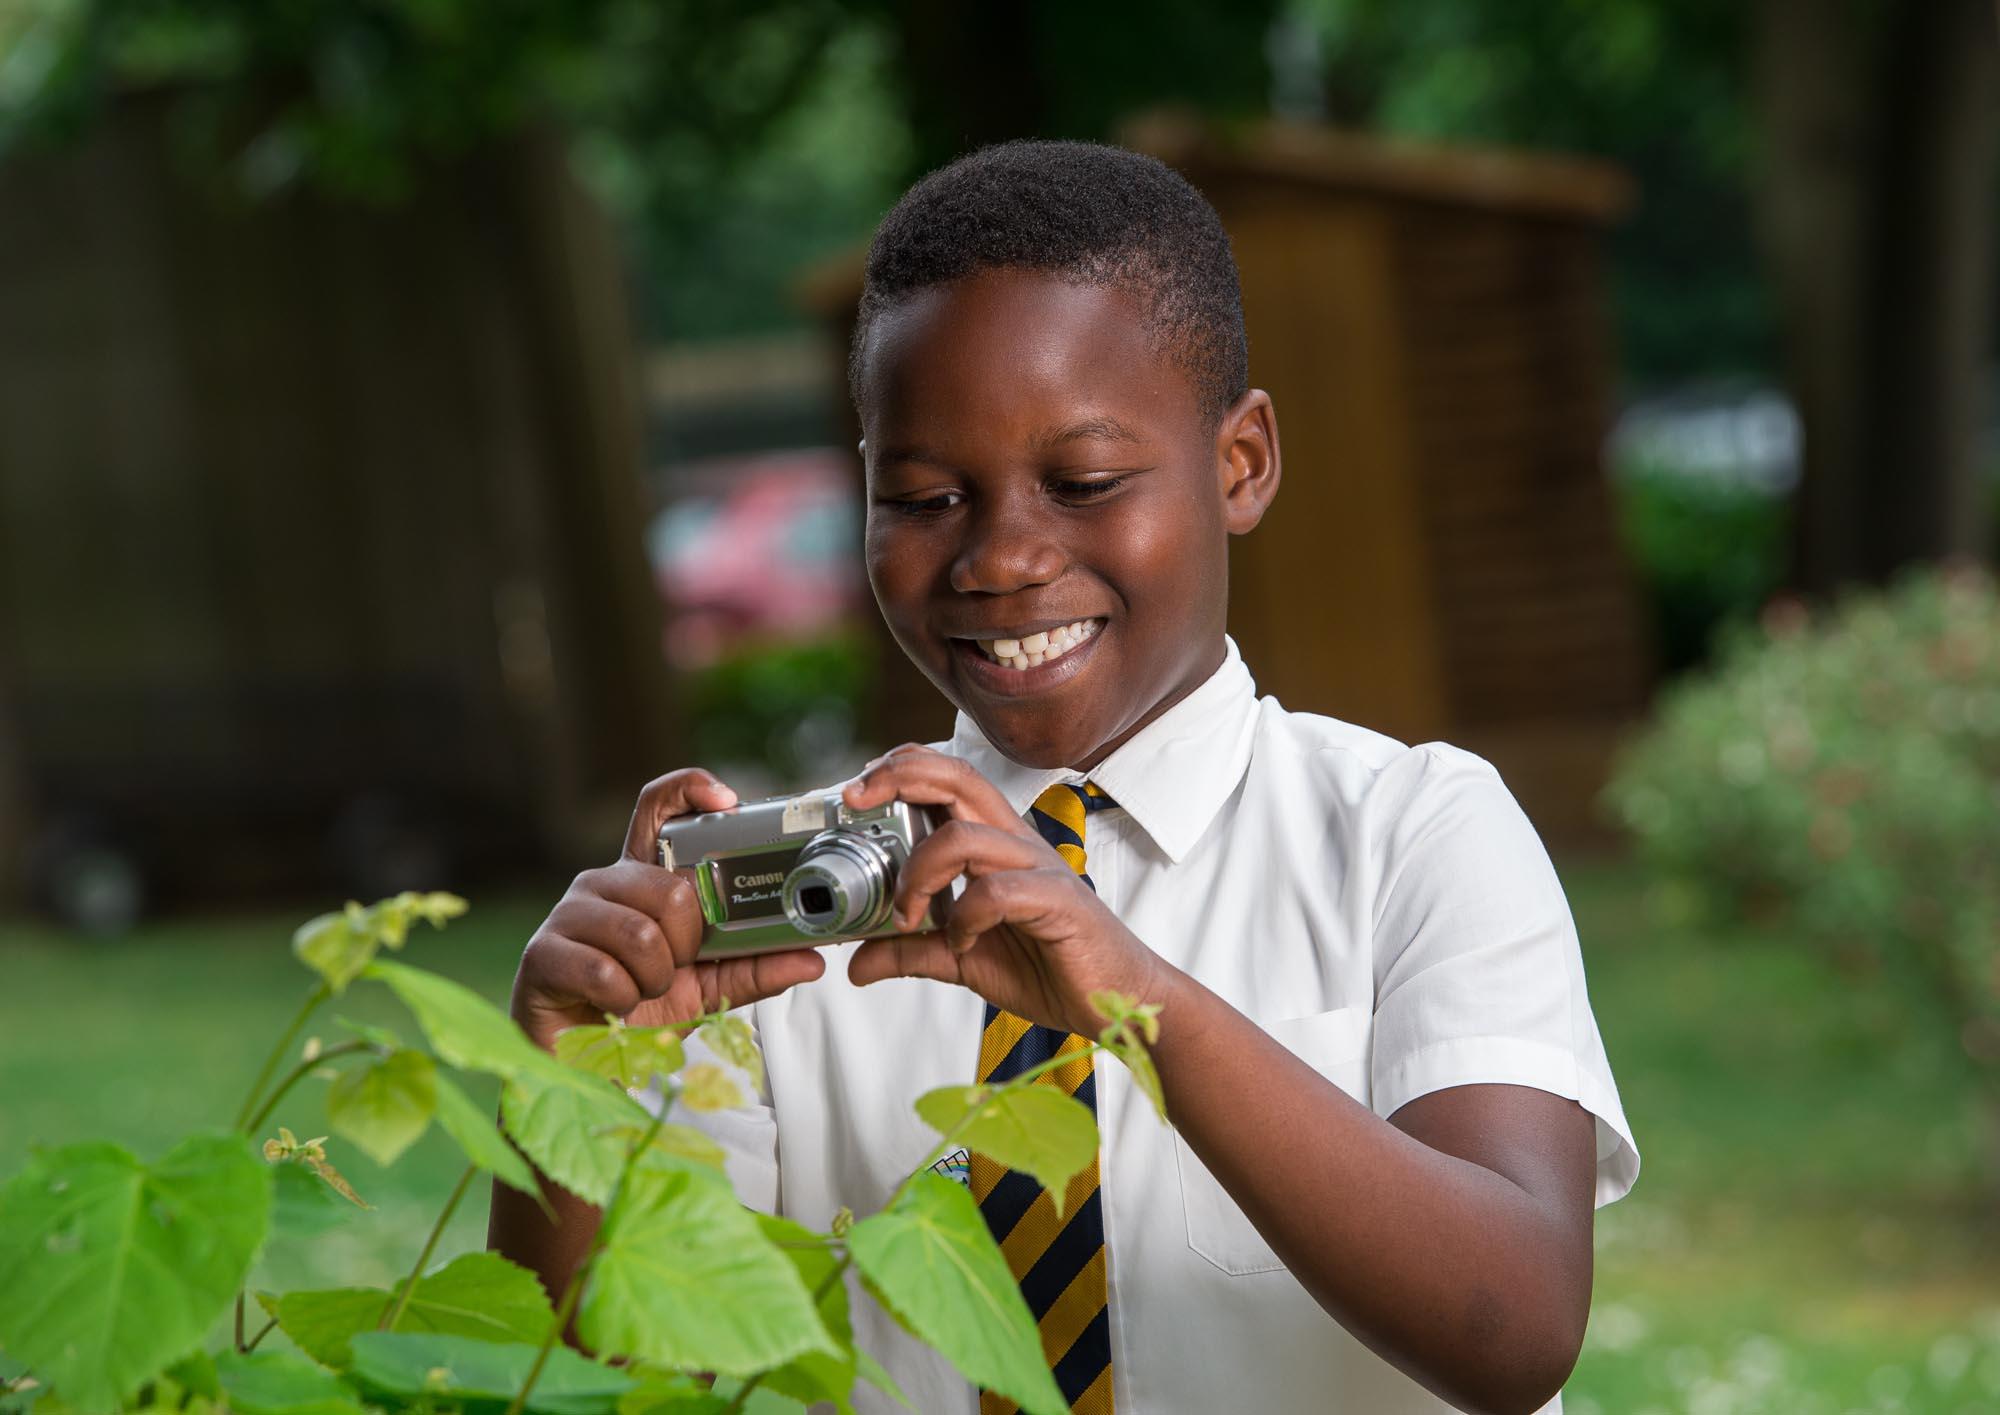 Boy taking photographs of plants